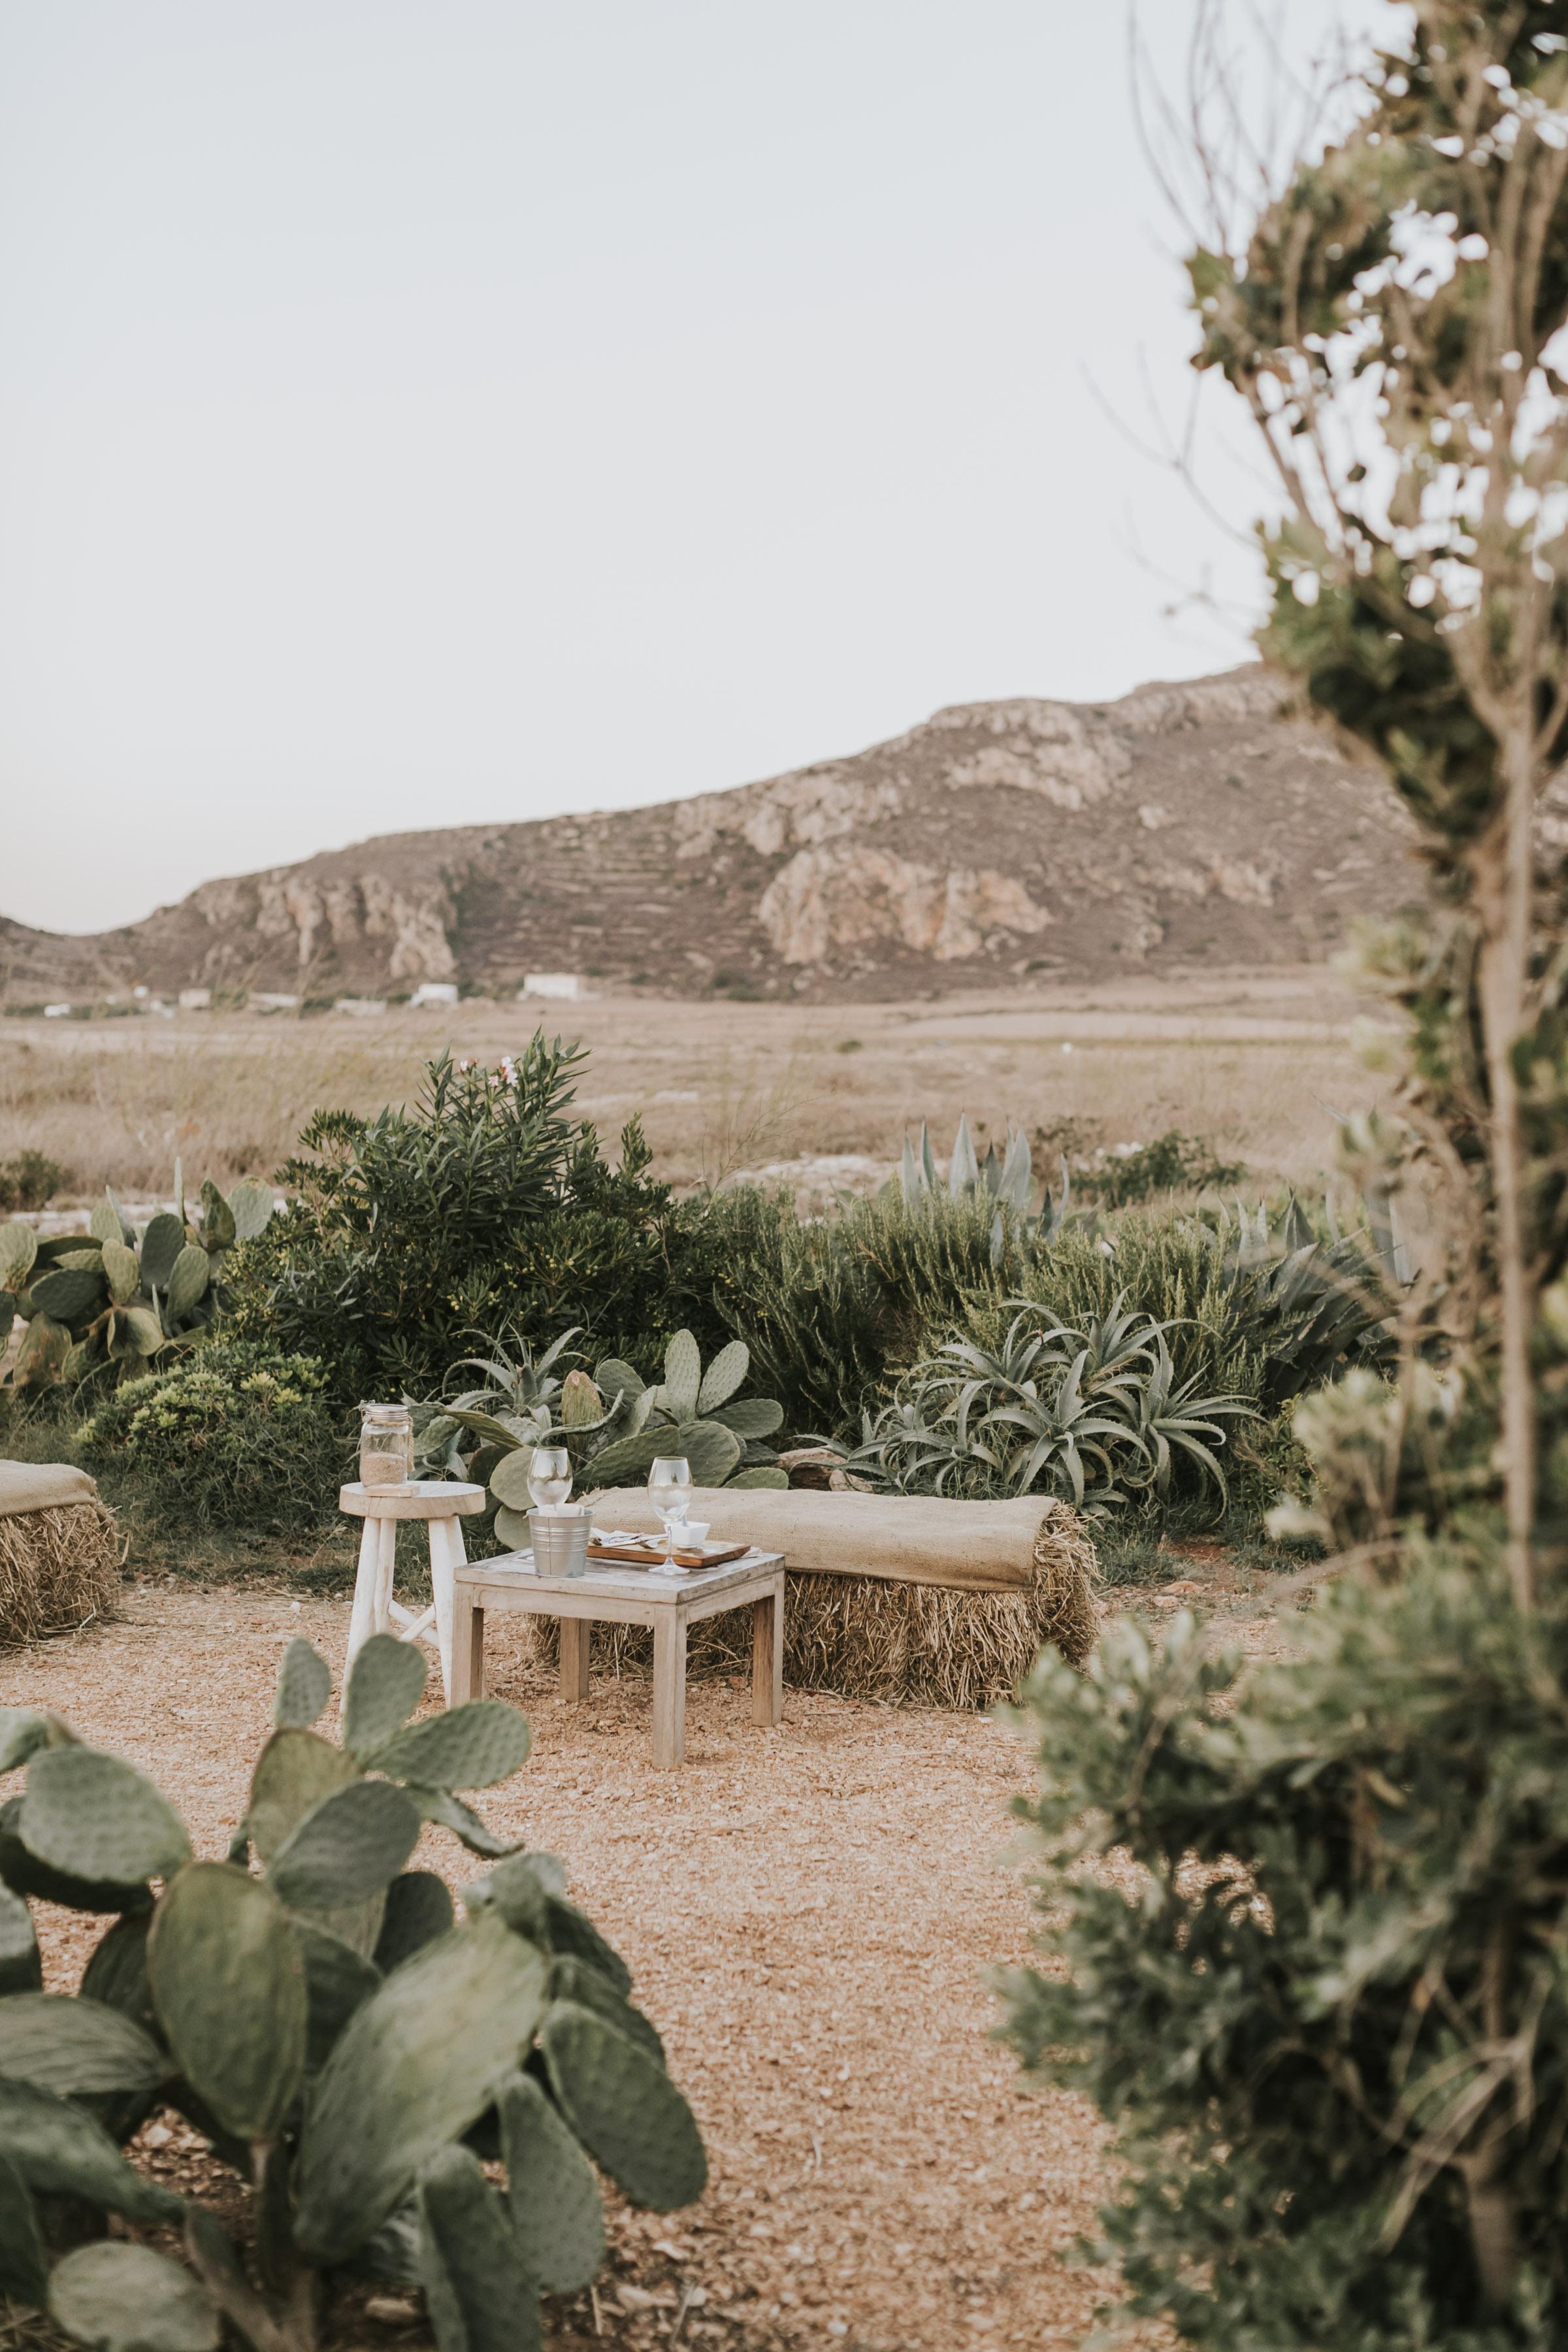 Sicily-AUG2018-CreditAllisonKuhlPhotos-4383.jpg